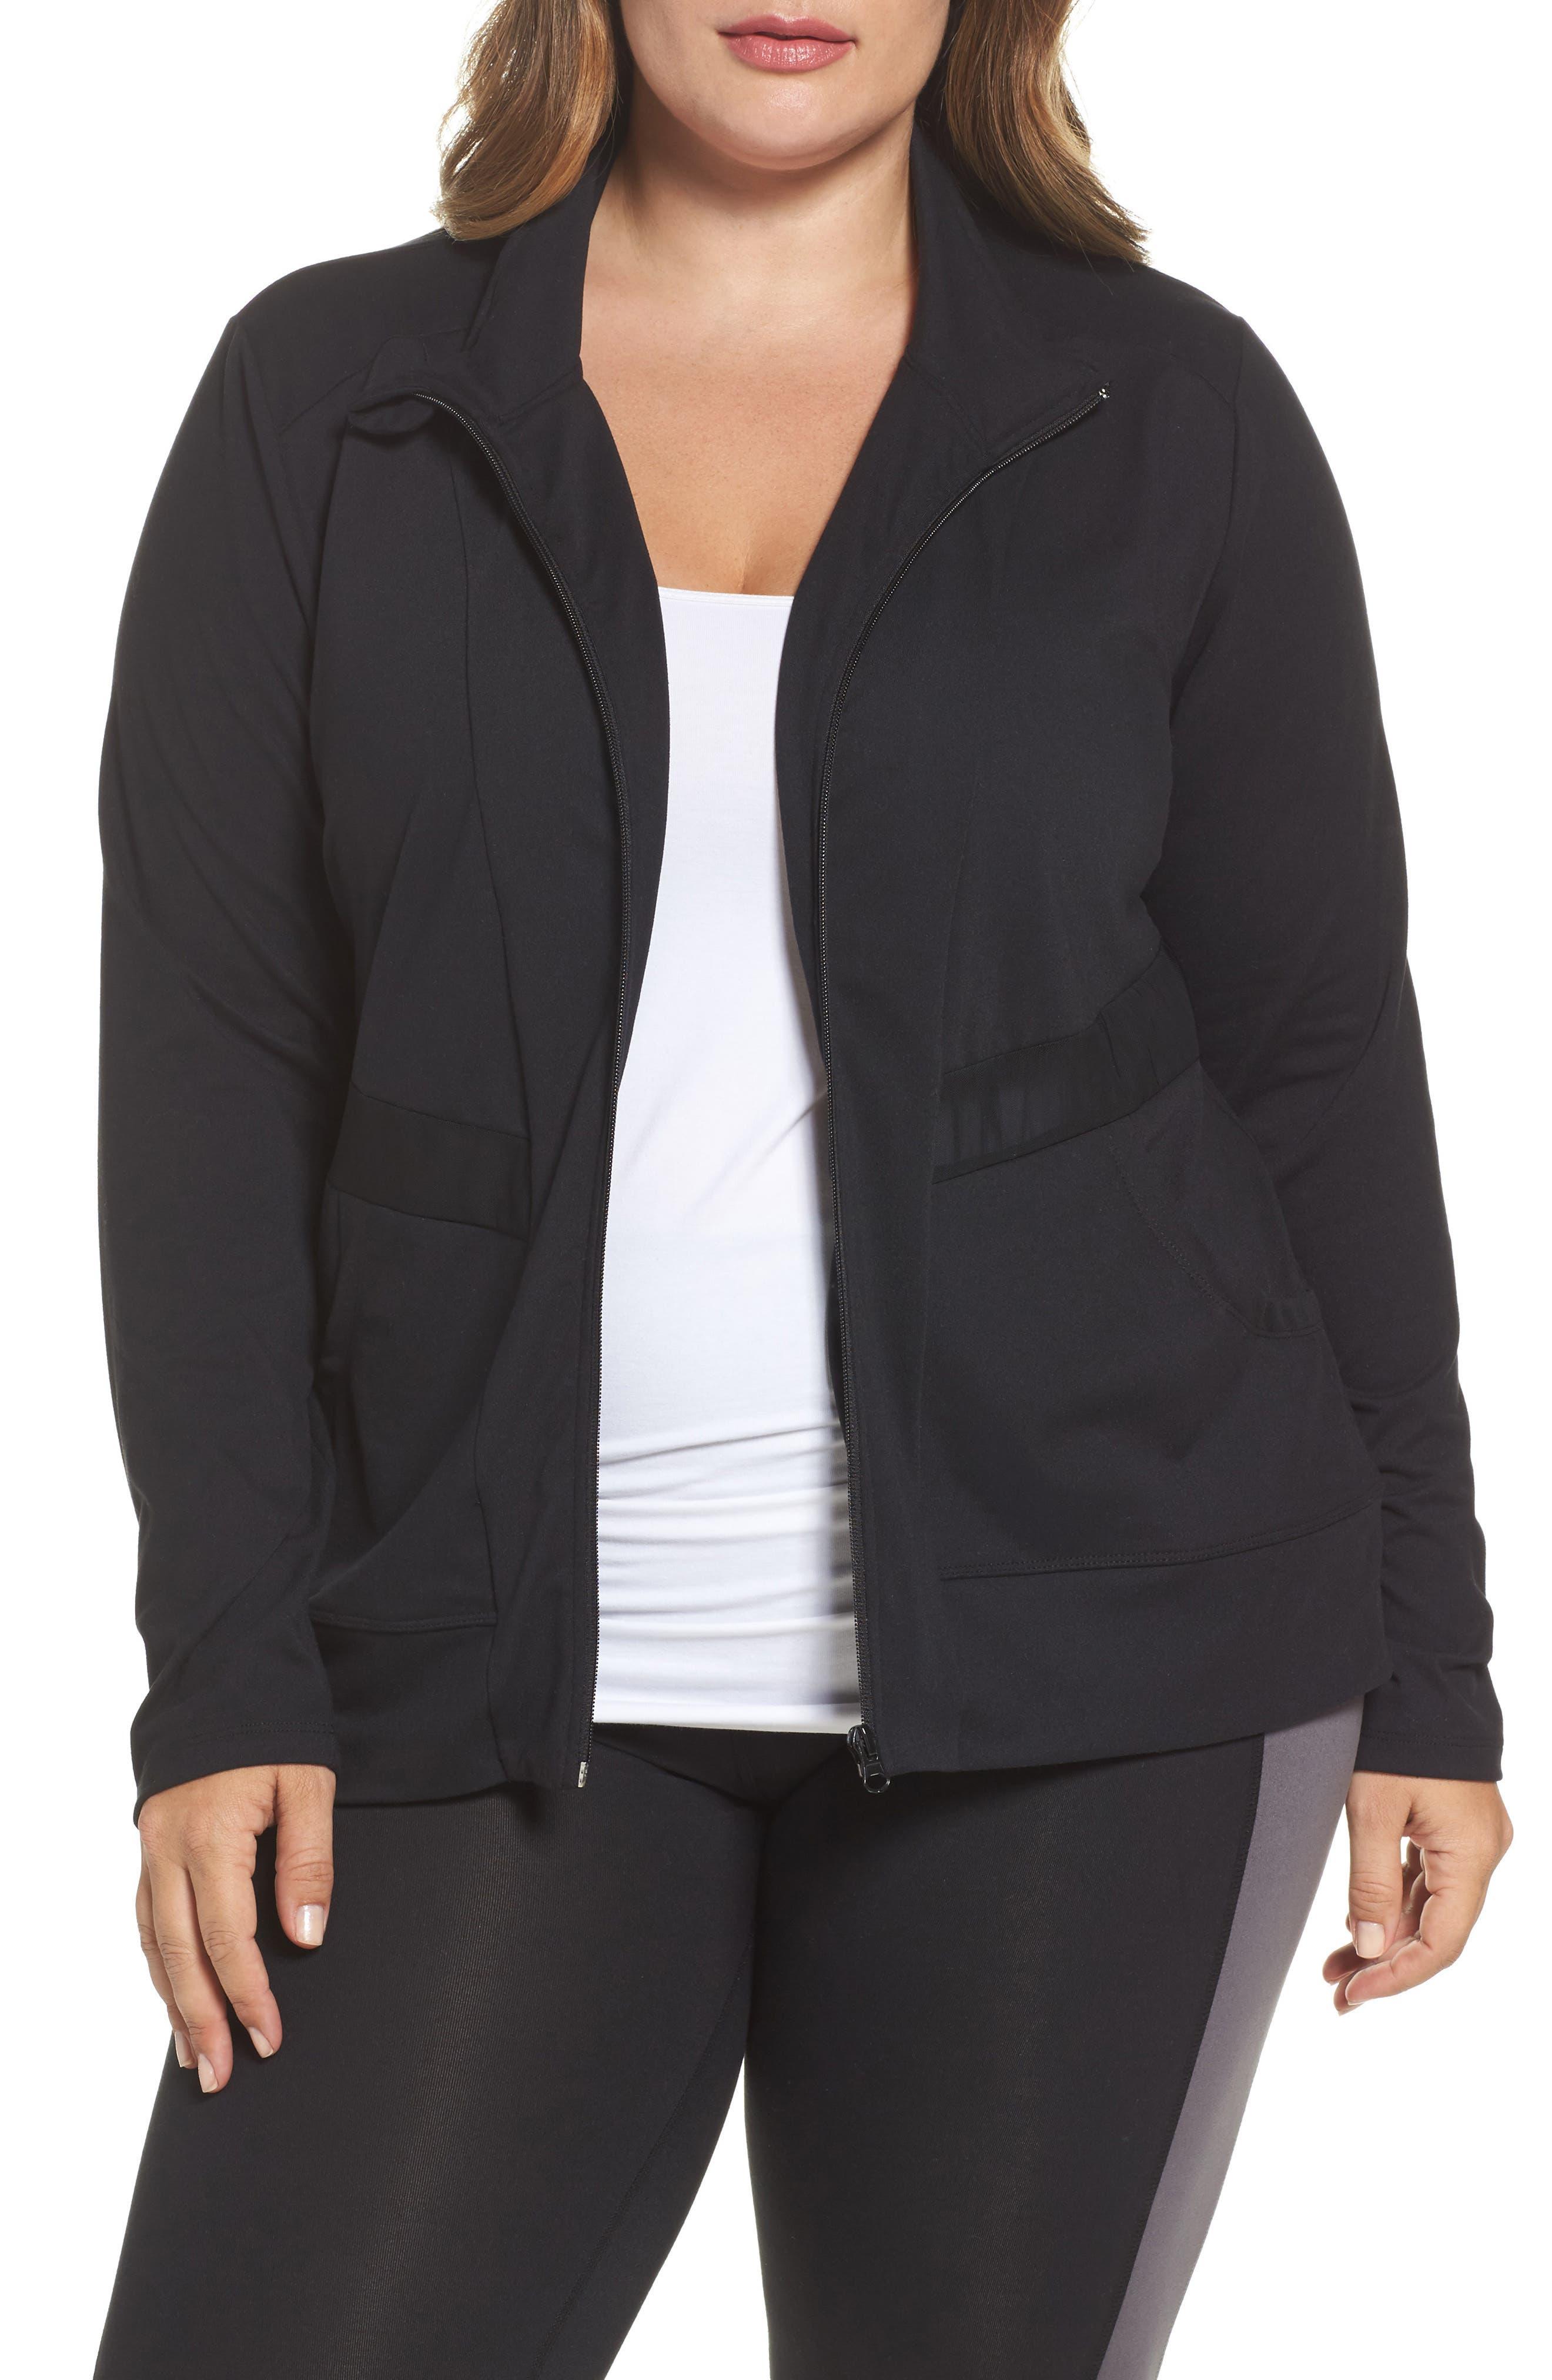 Adrenaline Jacket,                         Main,                         color, 001-Black